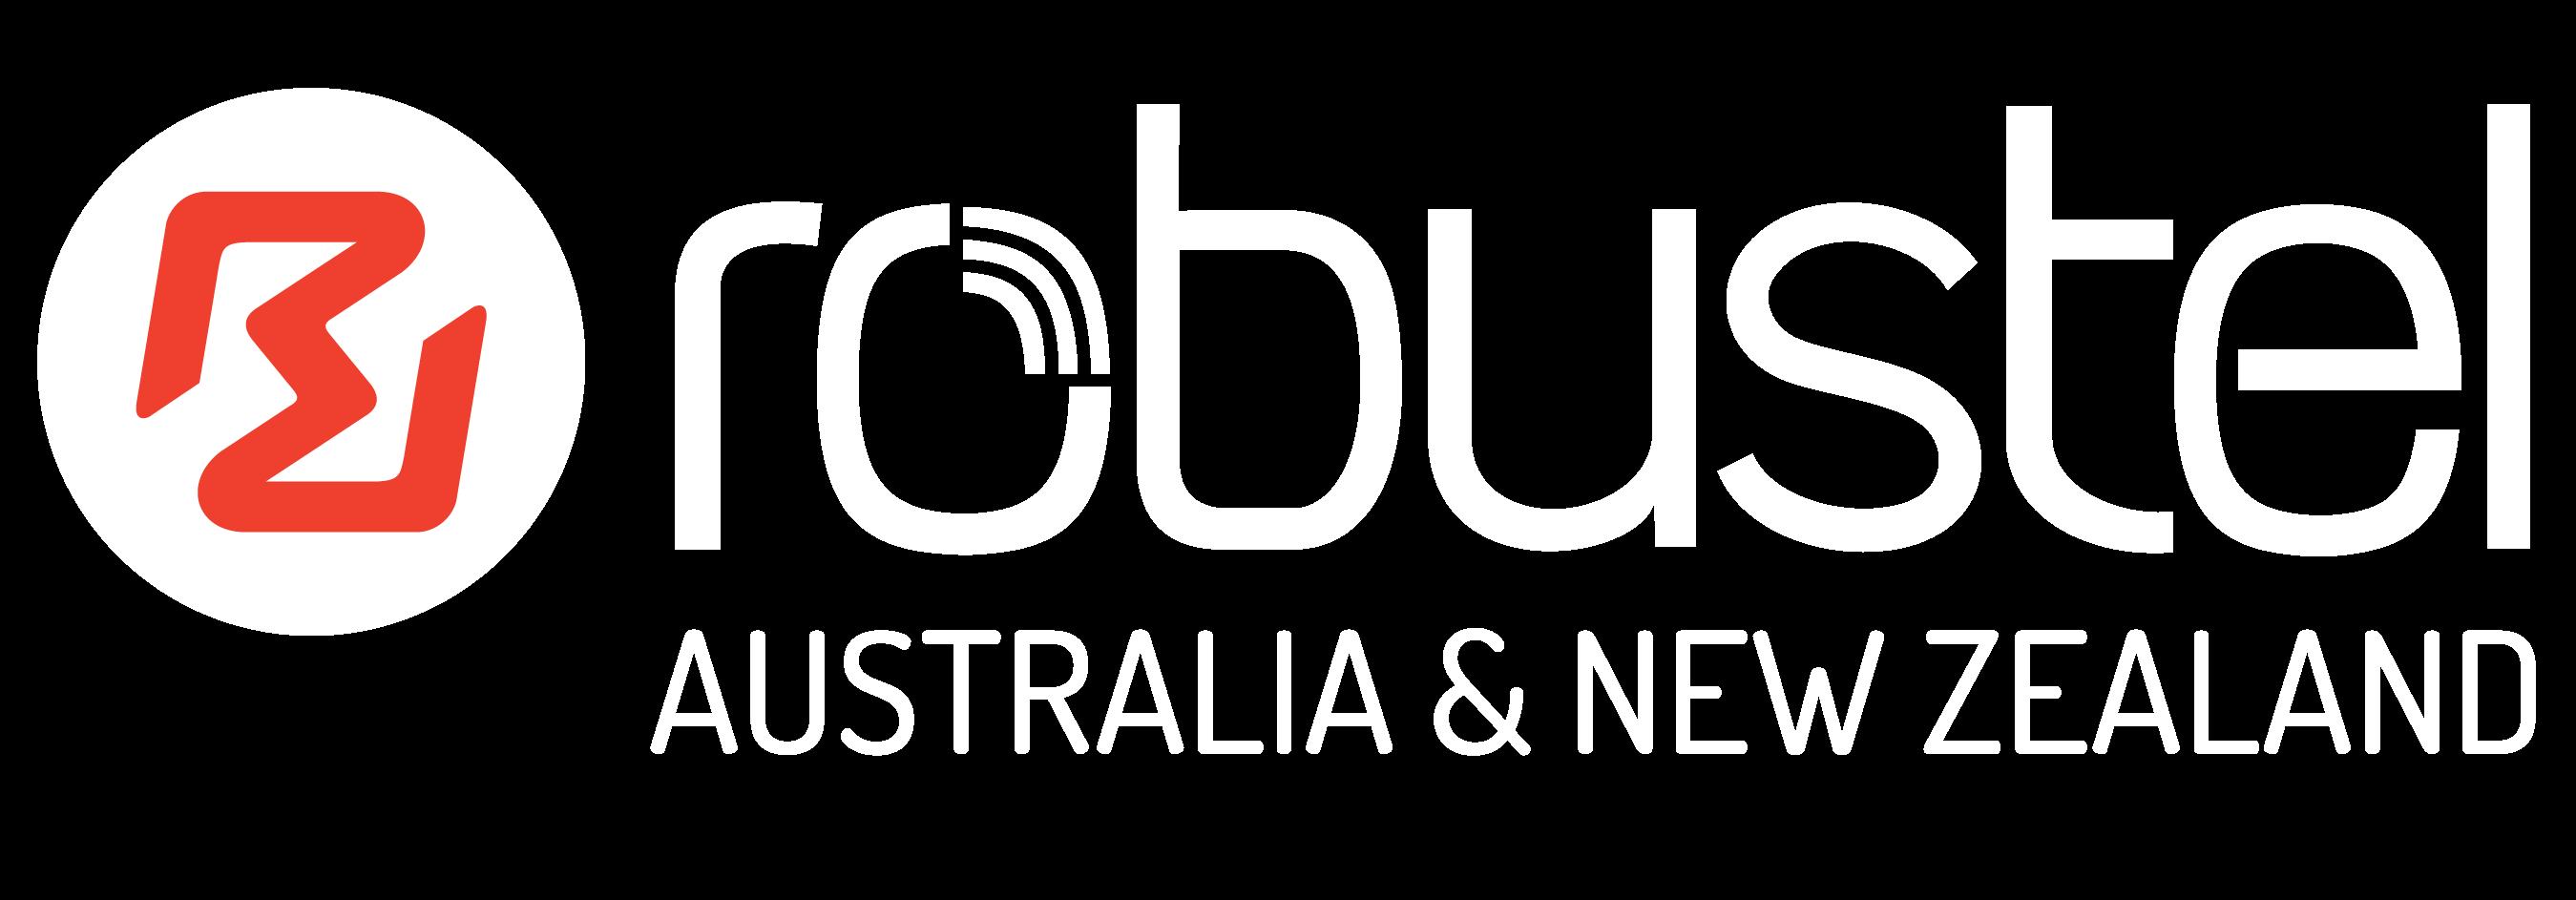 Robustel Australia and New Zealand